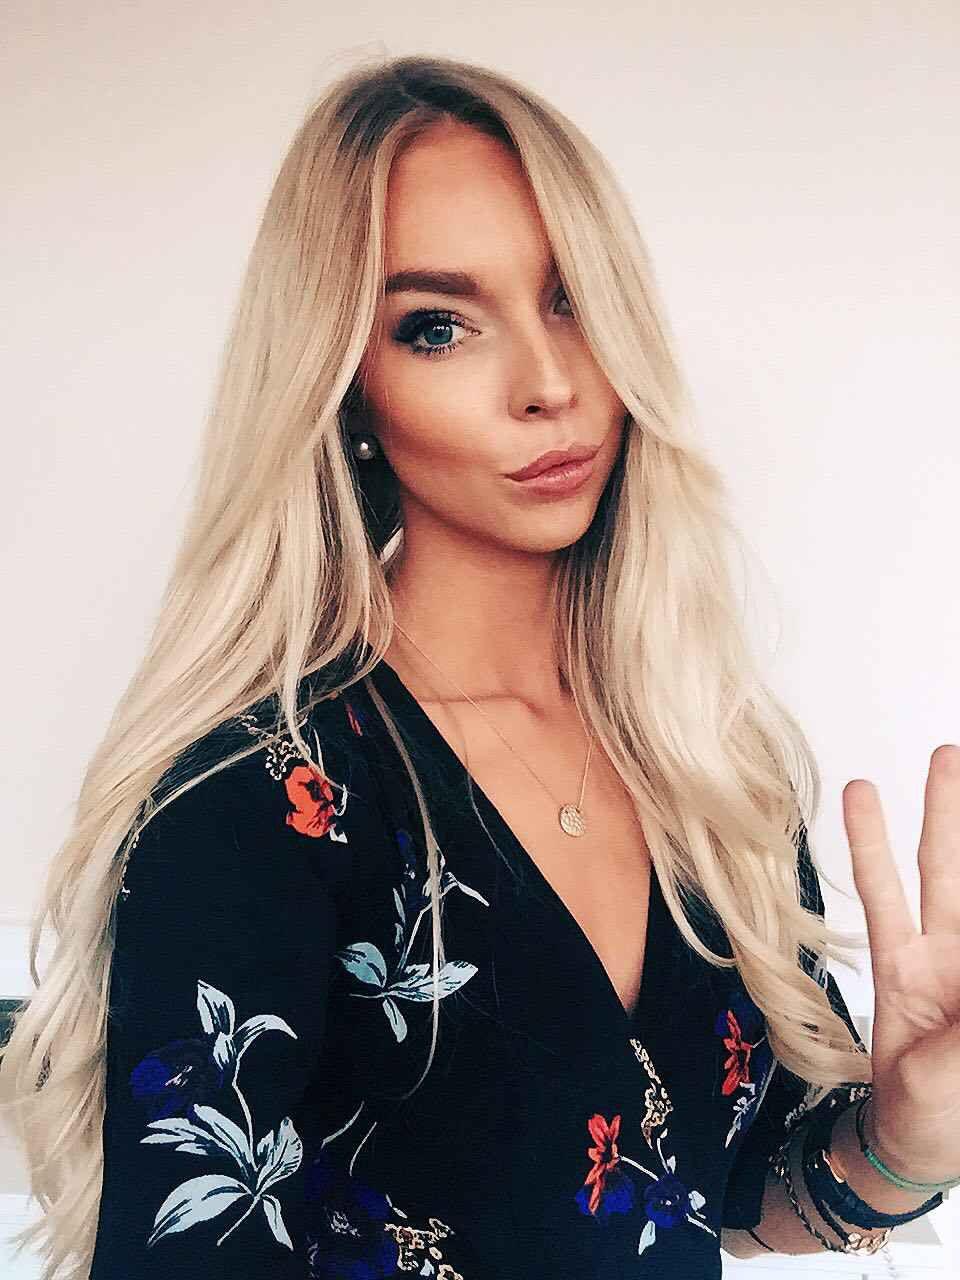 IG: @marita_knappen   #blonde #hair #natural #scandinavian #scandi #floral #wrap #dress #street #style #nobodyschild @nobodyschild